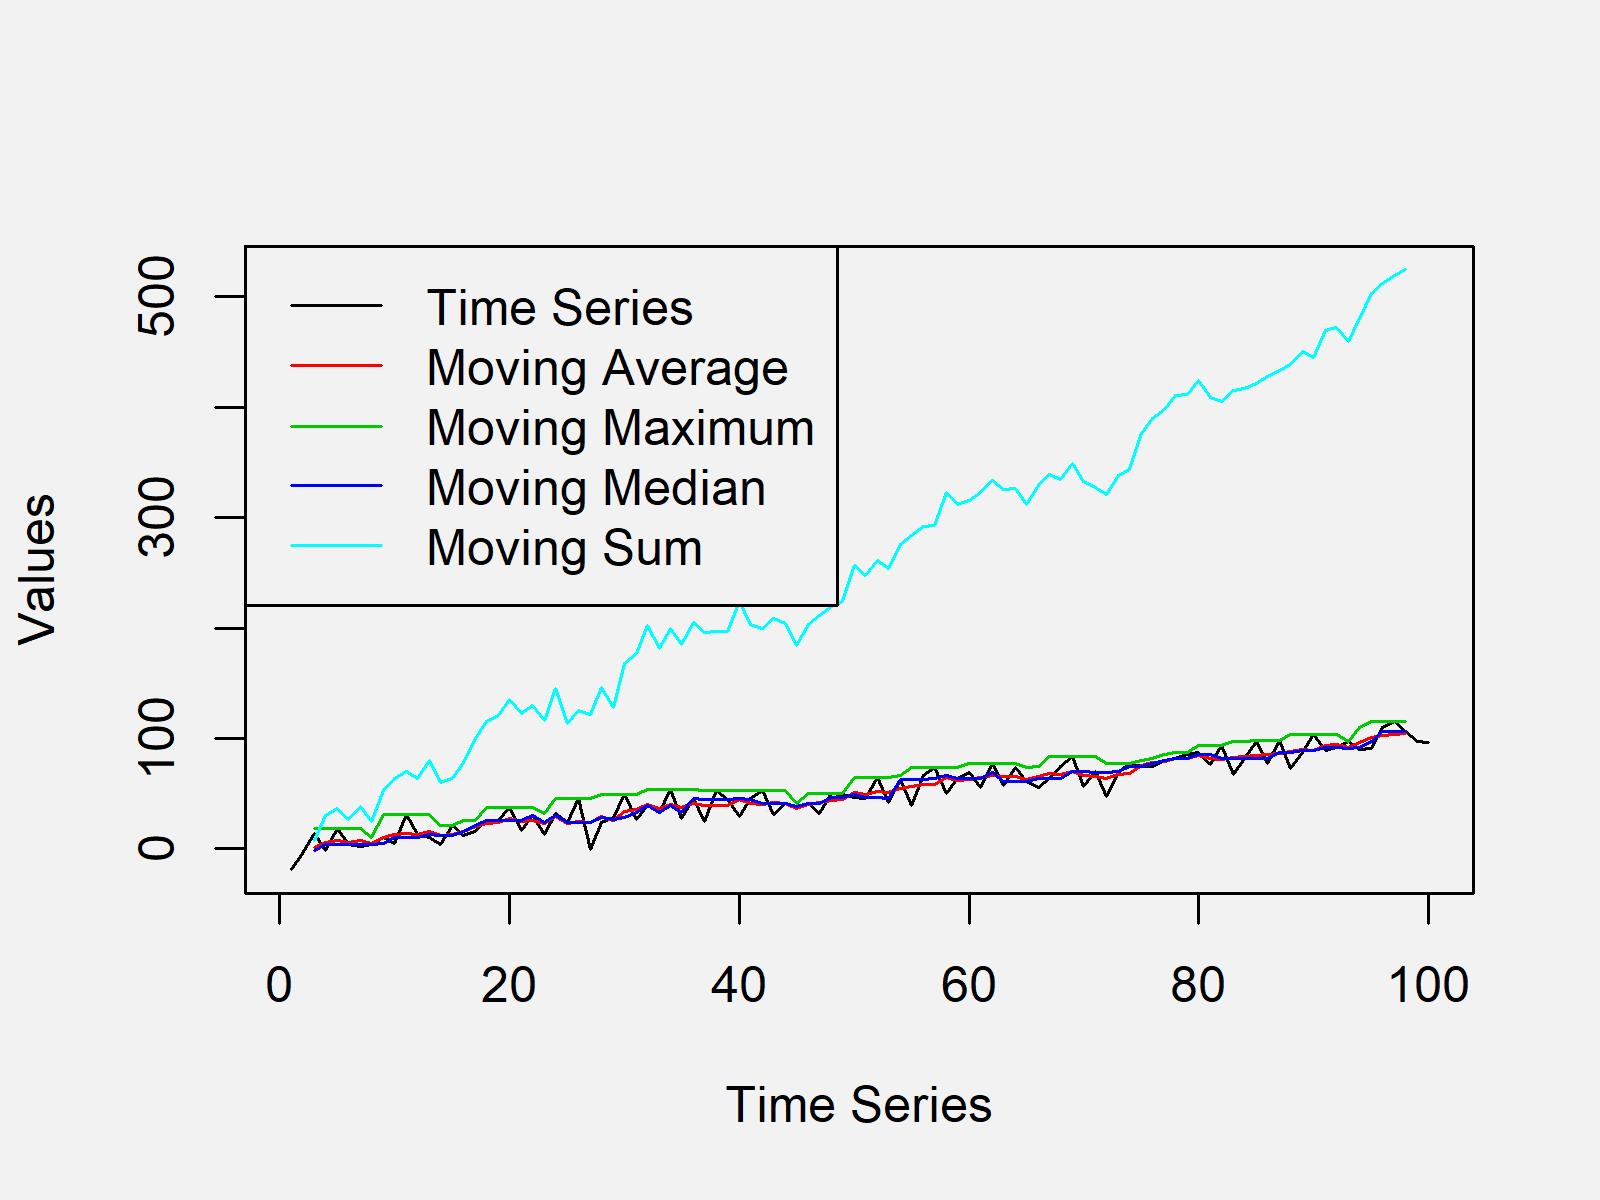 r graph figure 1 moving average maximum median sum time series r